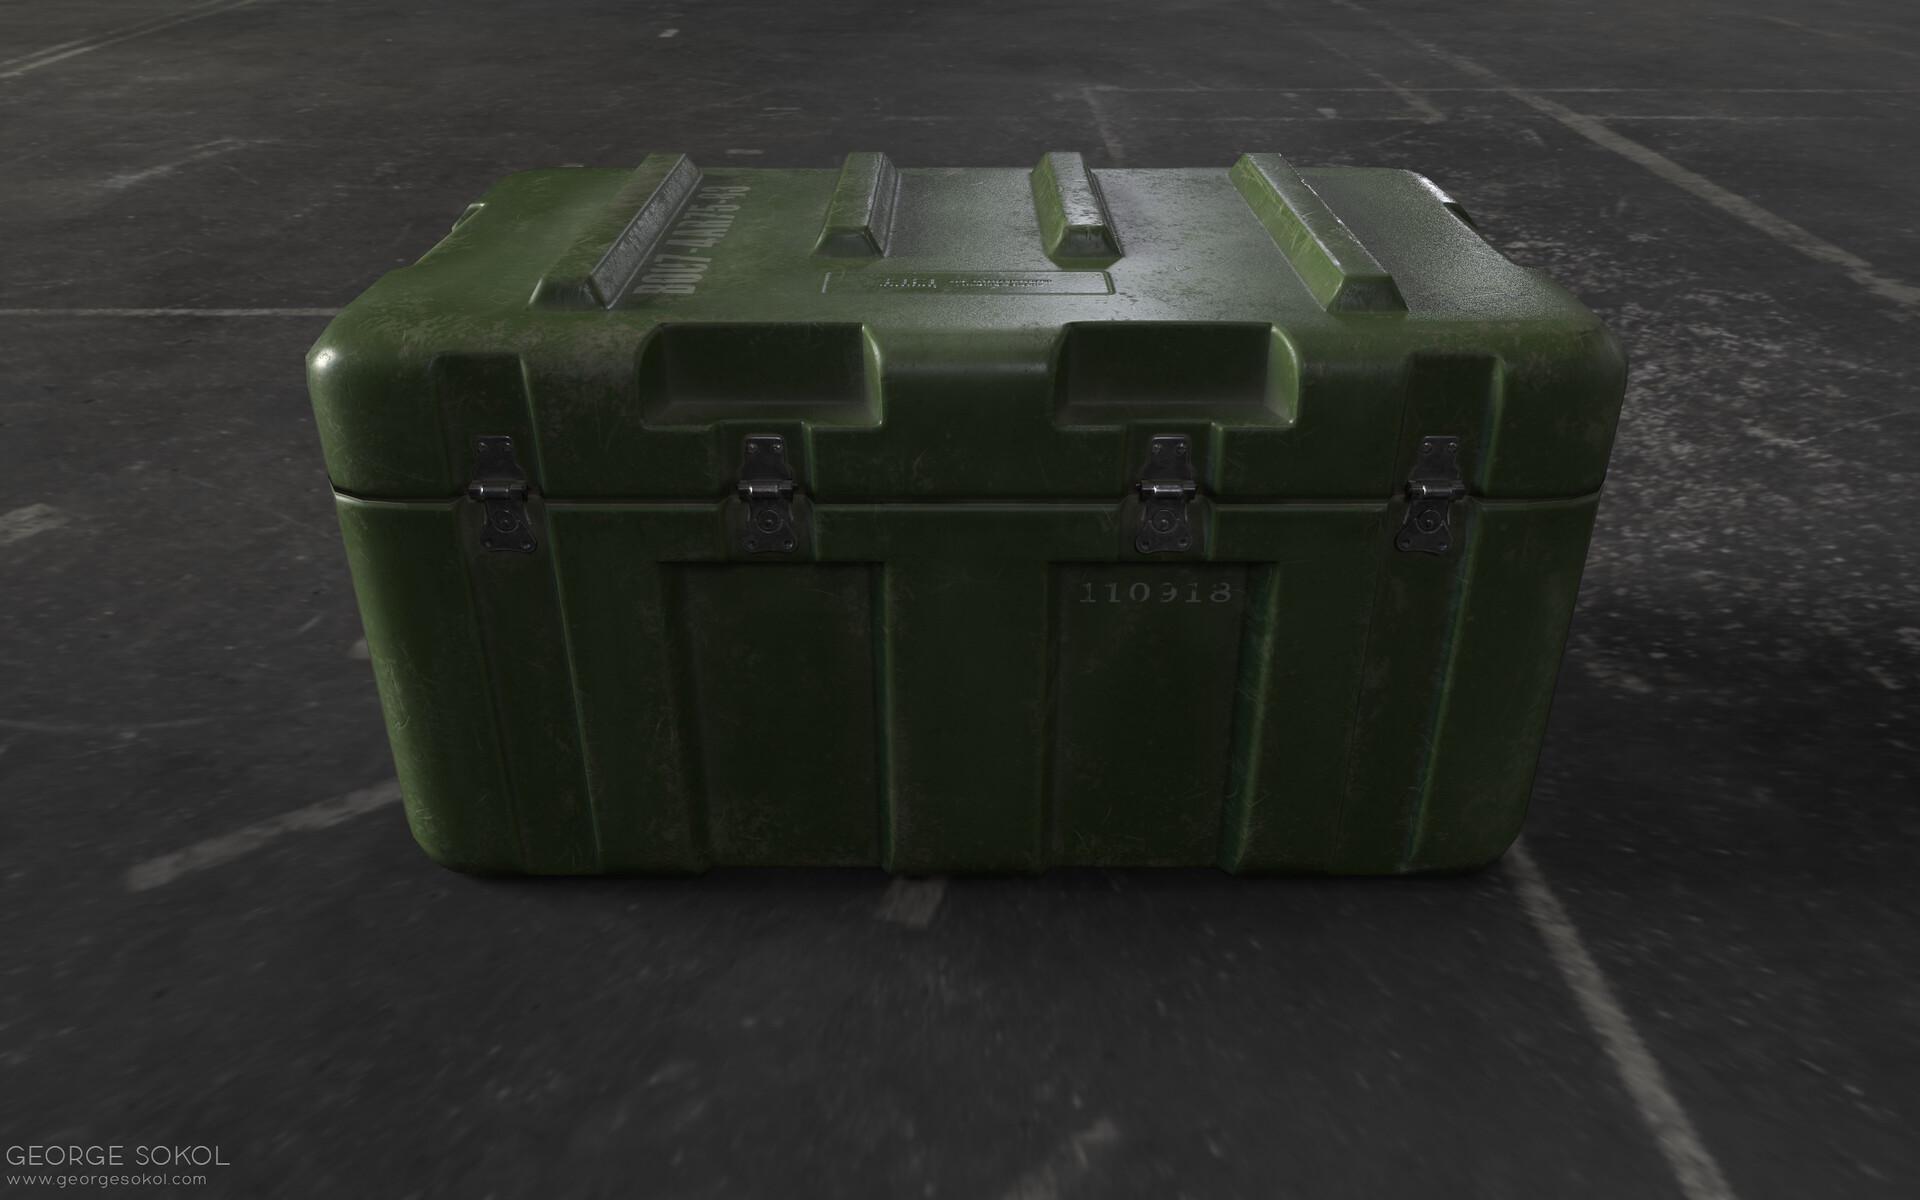 George sokol gs crate 1